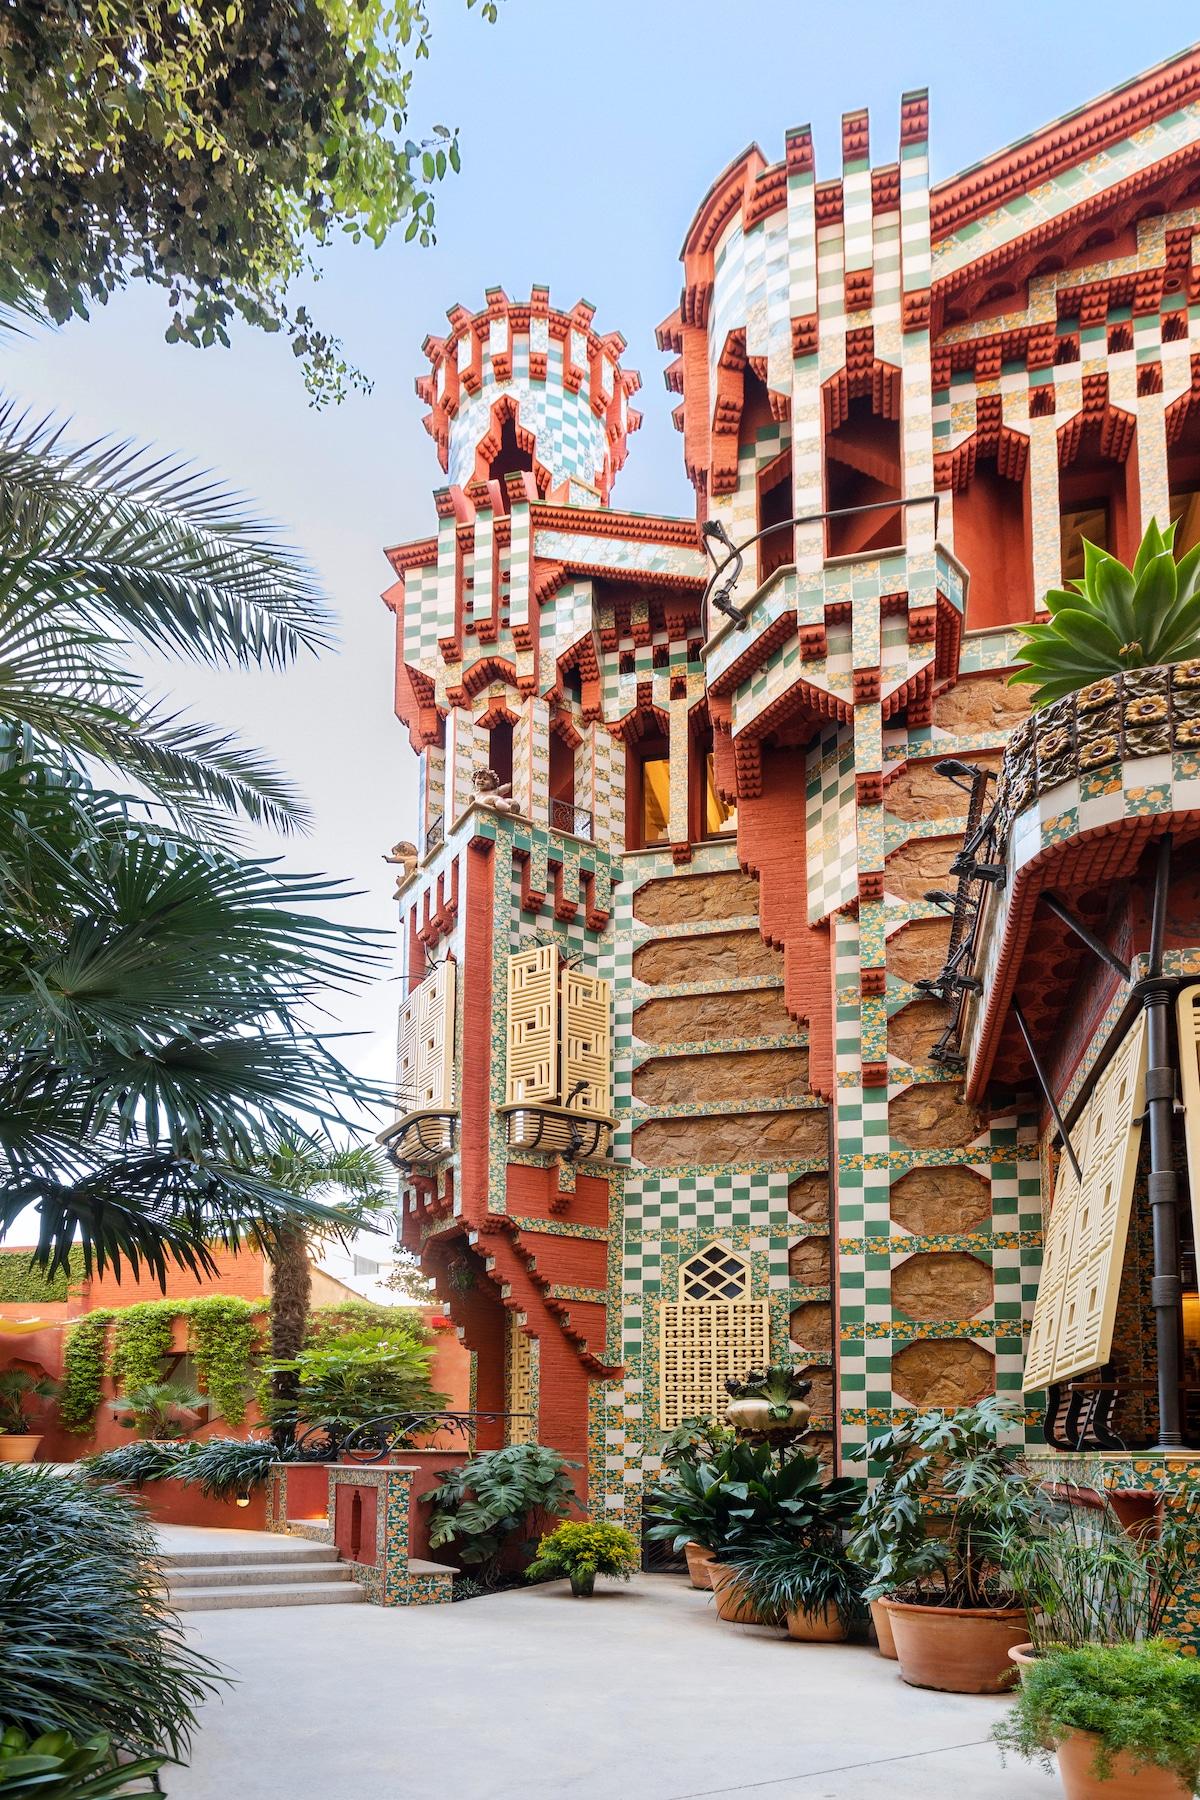 Casa Vicens by Antoni Gaudí on Airbnb